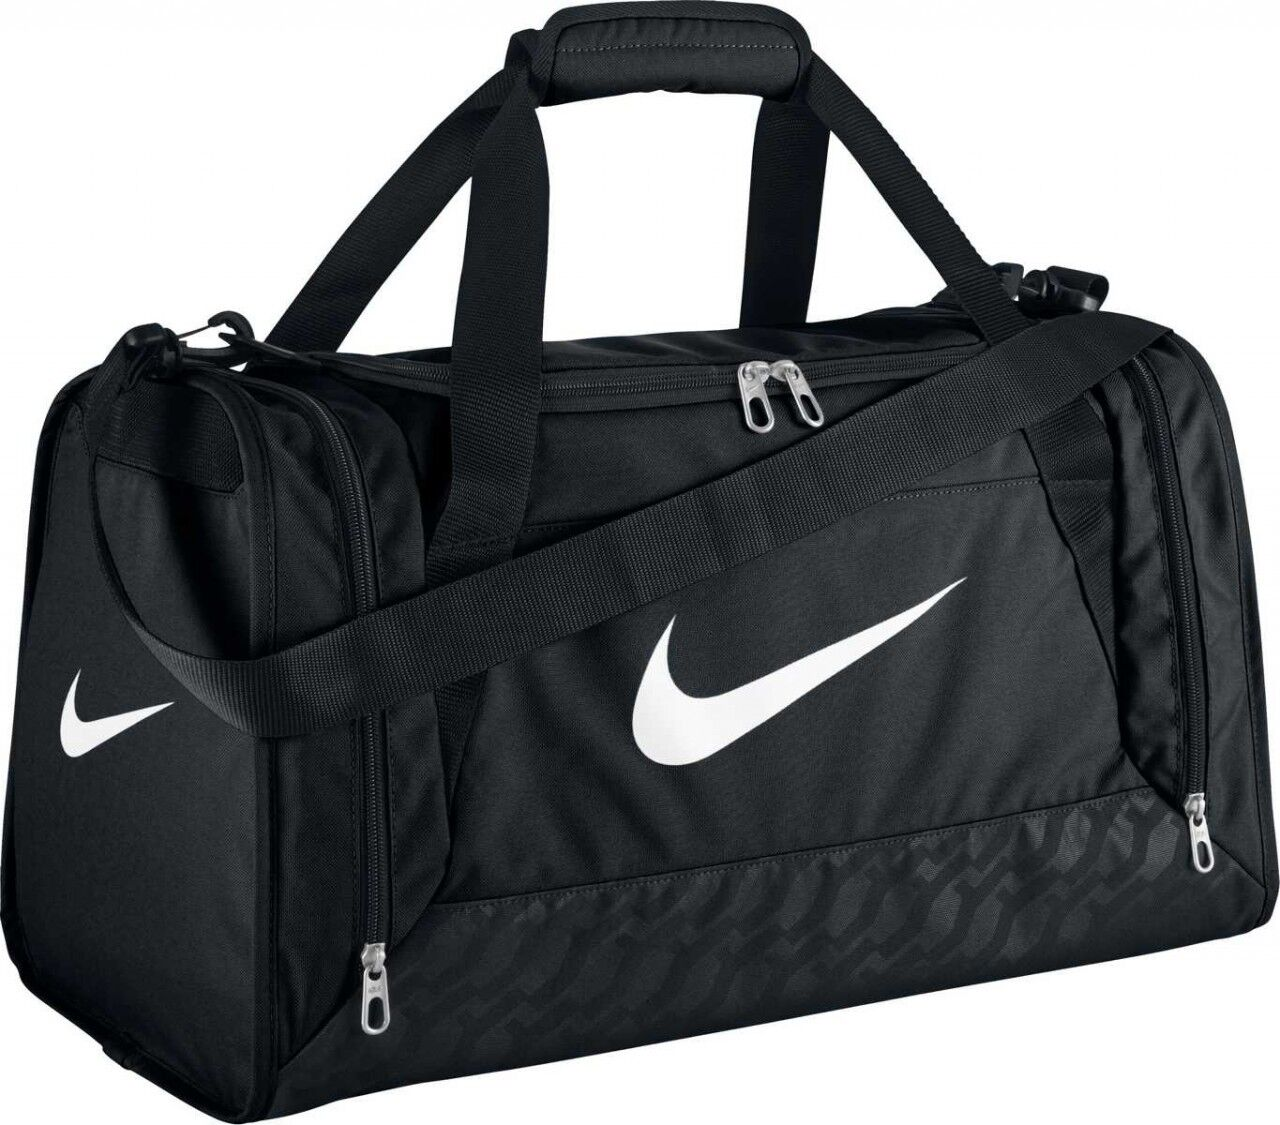 Galeria NIKE Sporttasche Brasilia 6 Fitness Duffel Small 41 Liter schwarz Gr. S Tasche